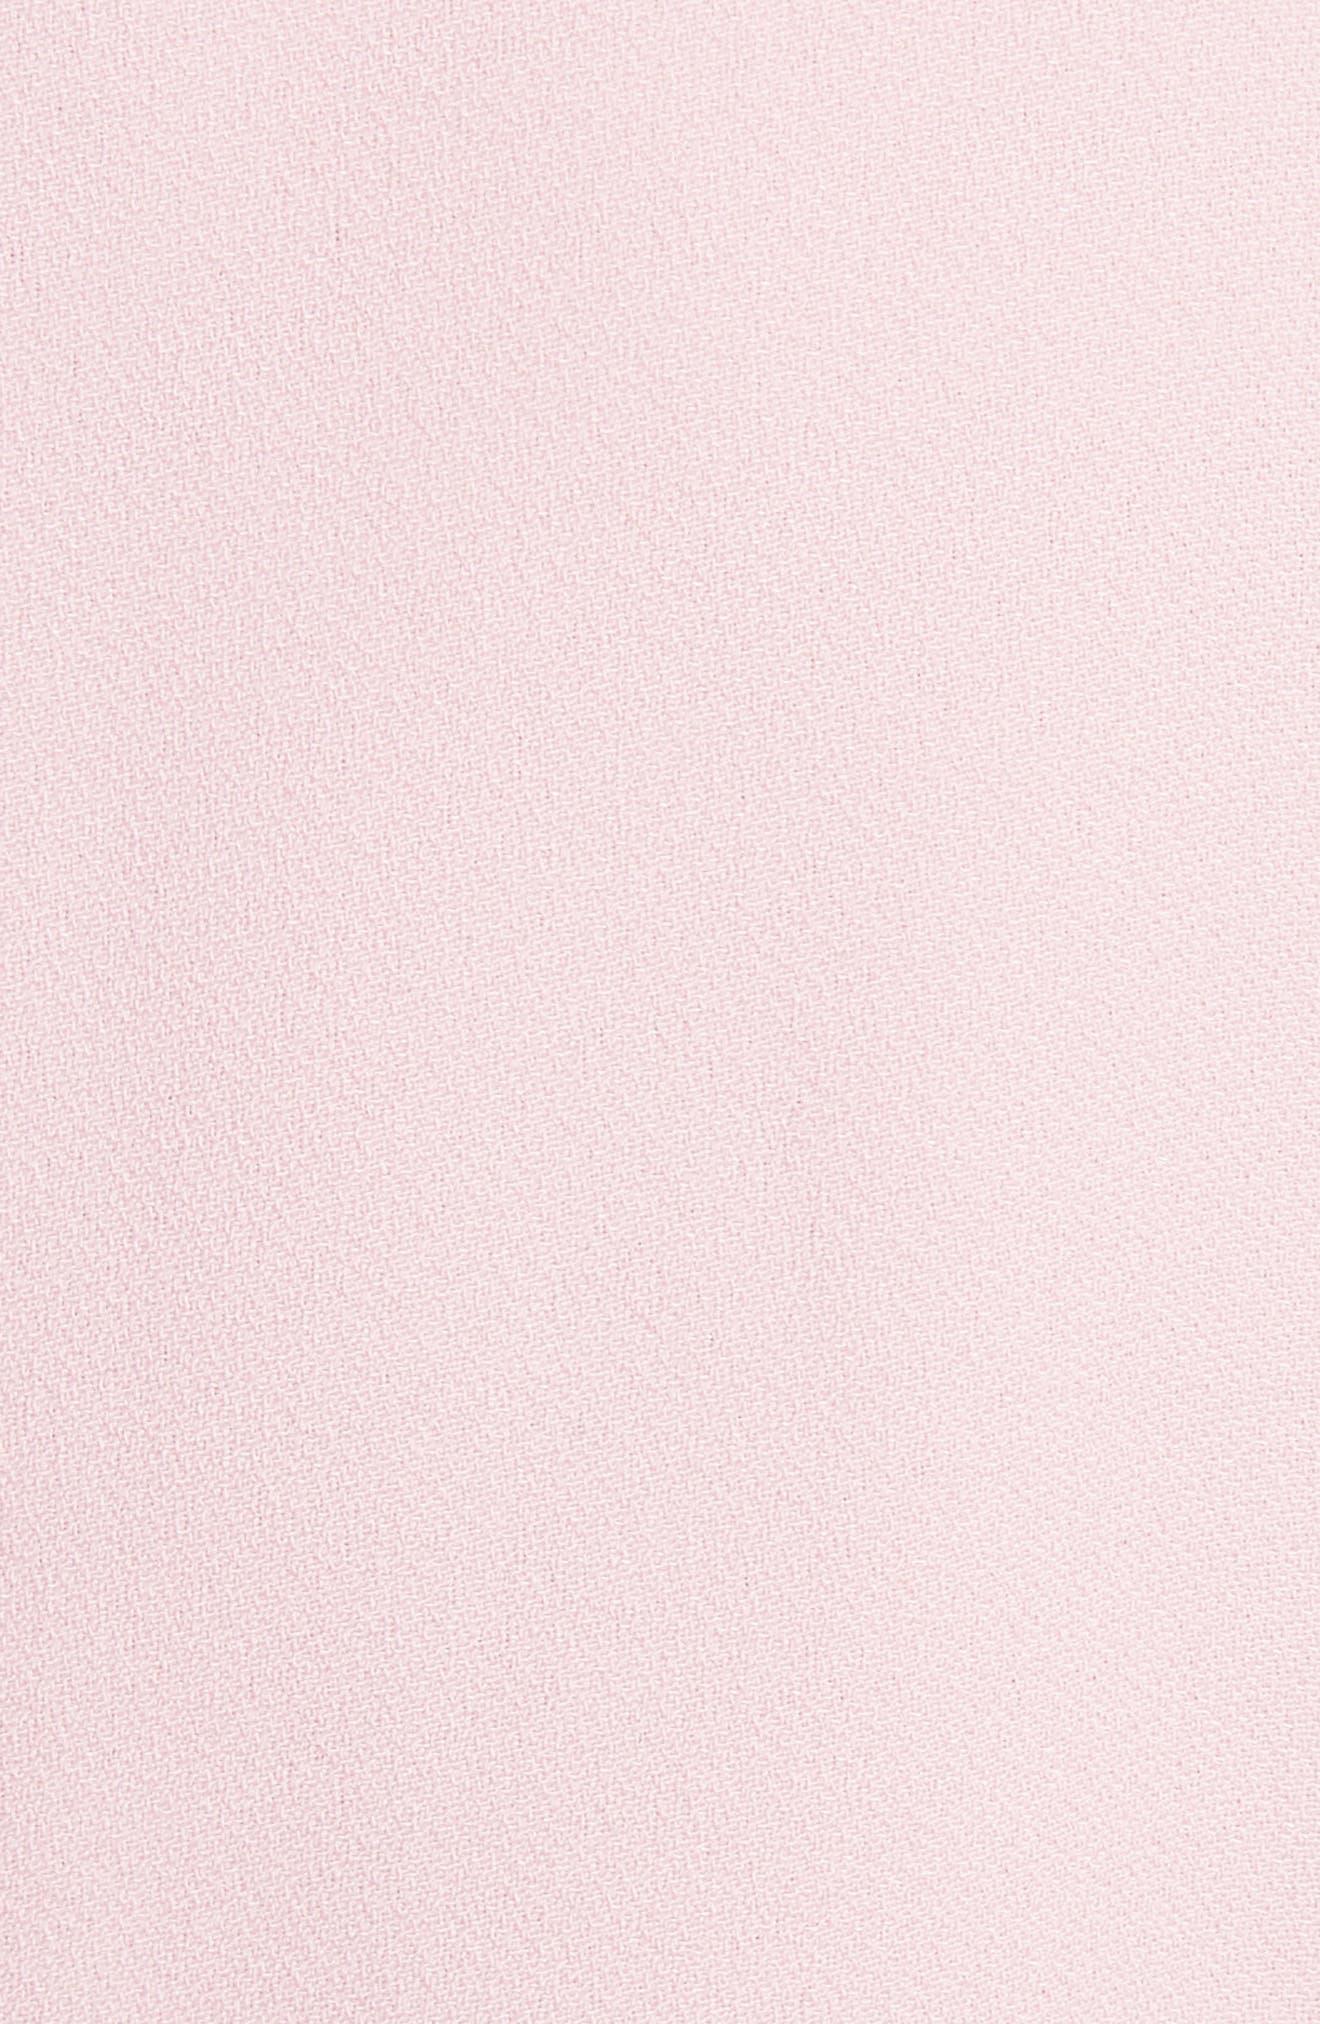 Steyla Ruffle Dress,                             Alternate thumbnail 5, color,                             Dusky Pink